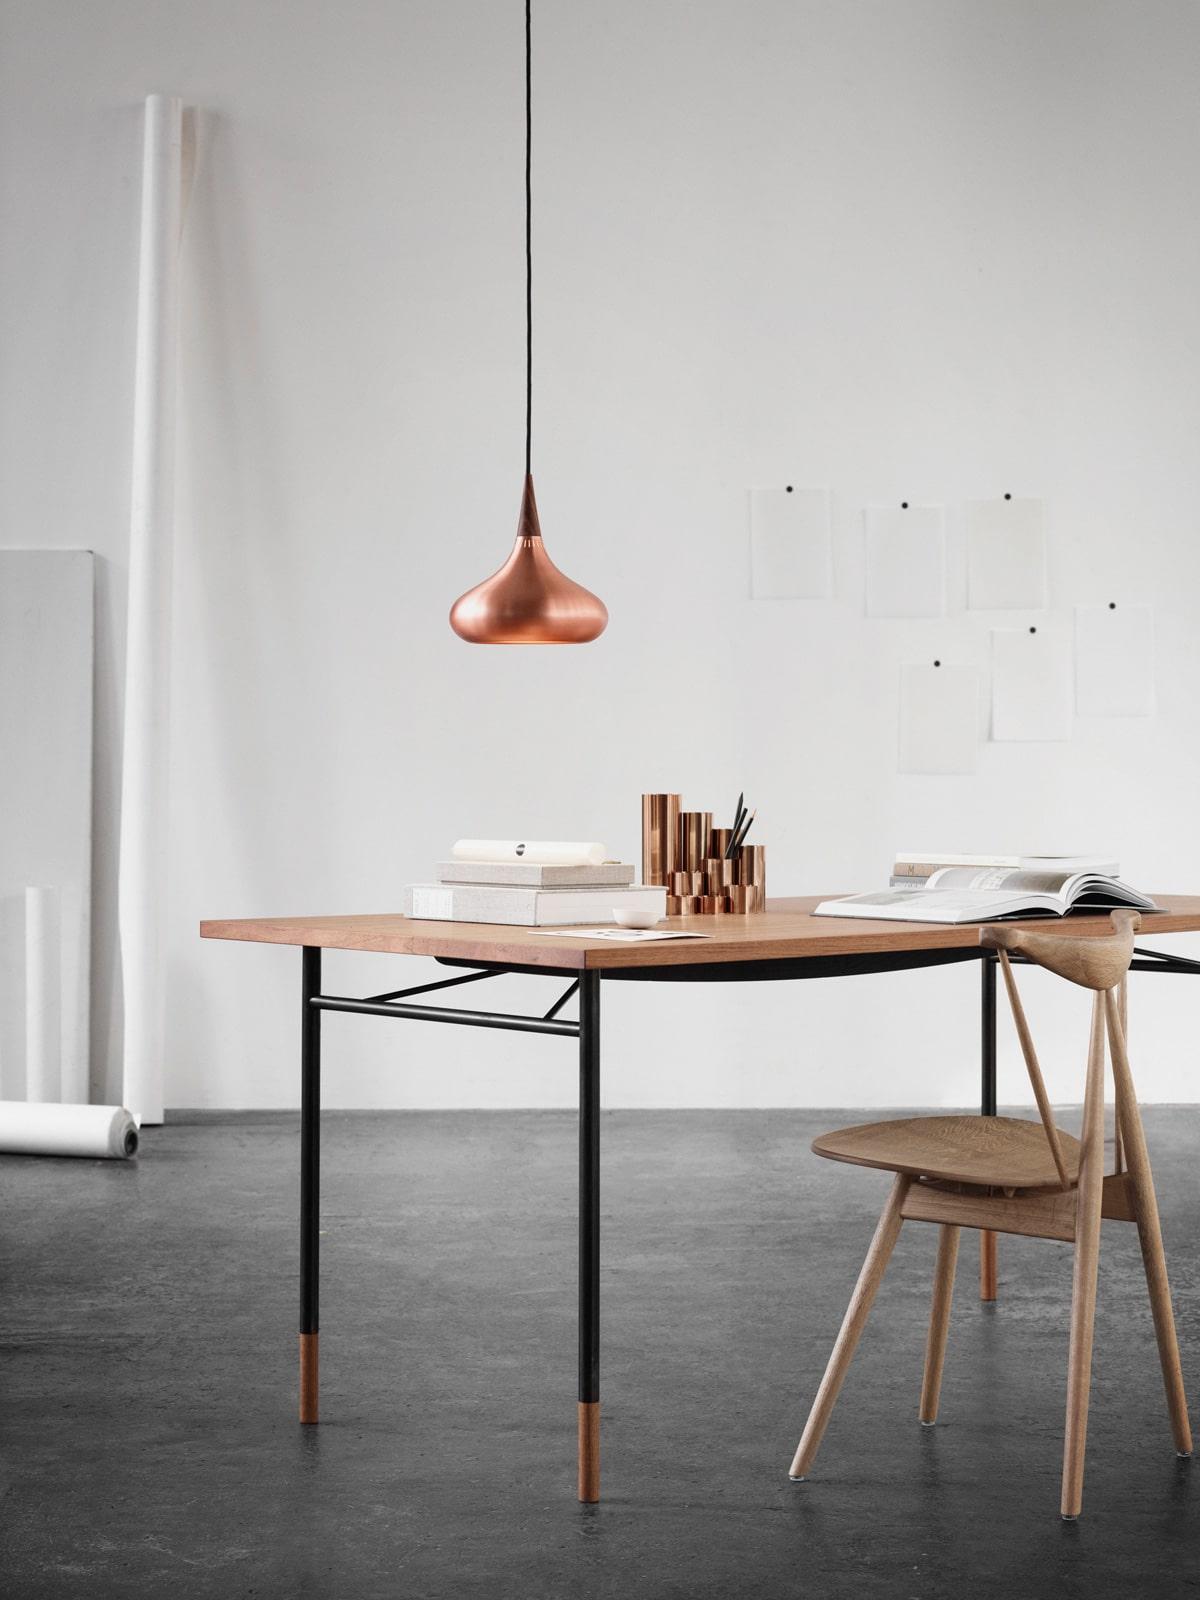 orient lampen leuchten designerleuchten online berlin design. Black Bedroom Furniture Sets. Home Design Ideas